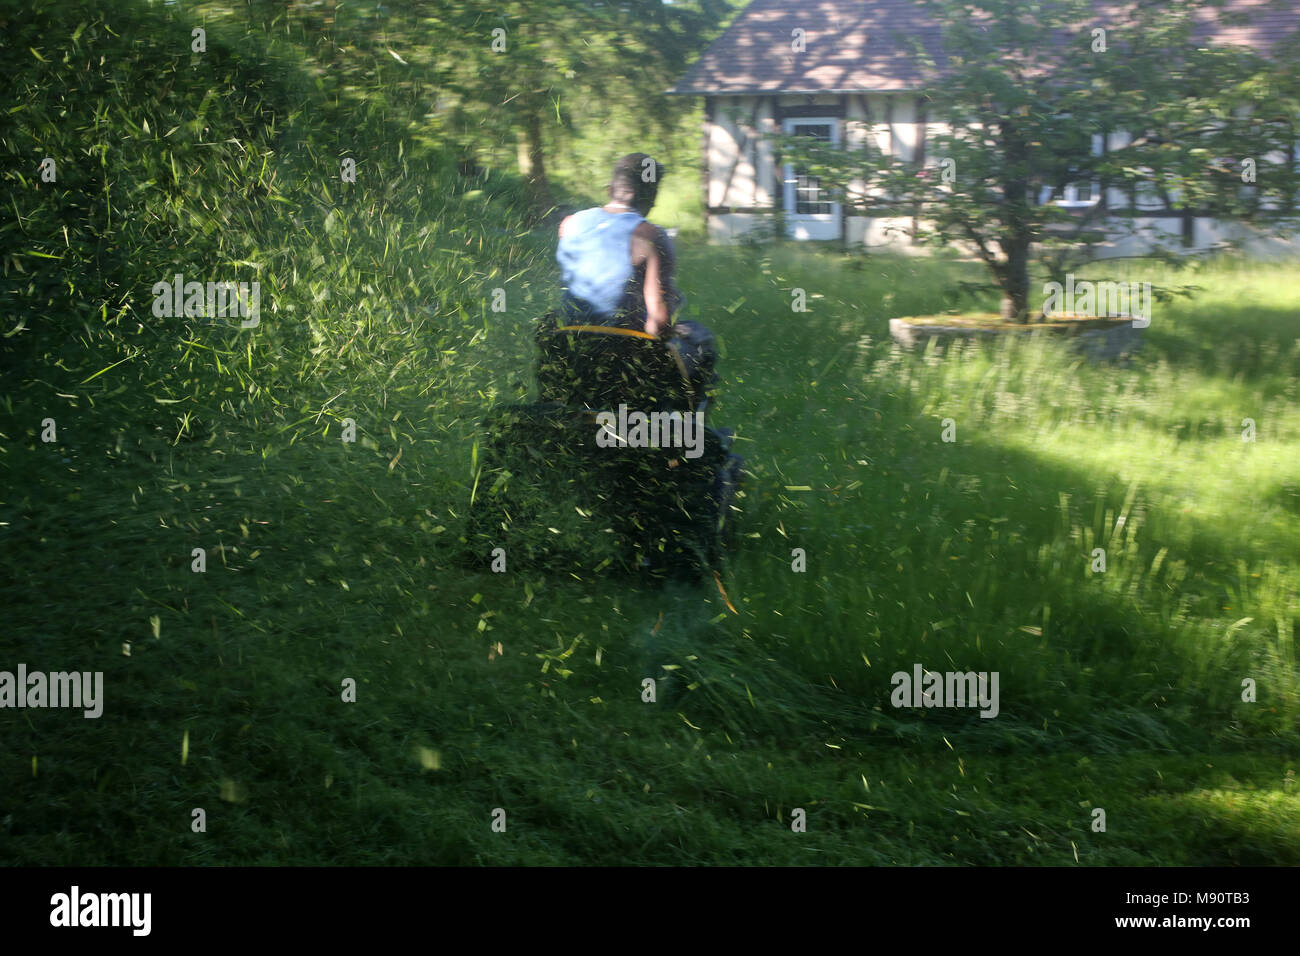 La tonte du gazon. Eure, France. Photo Stock